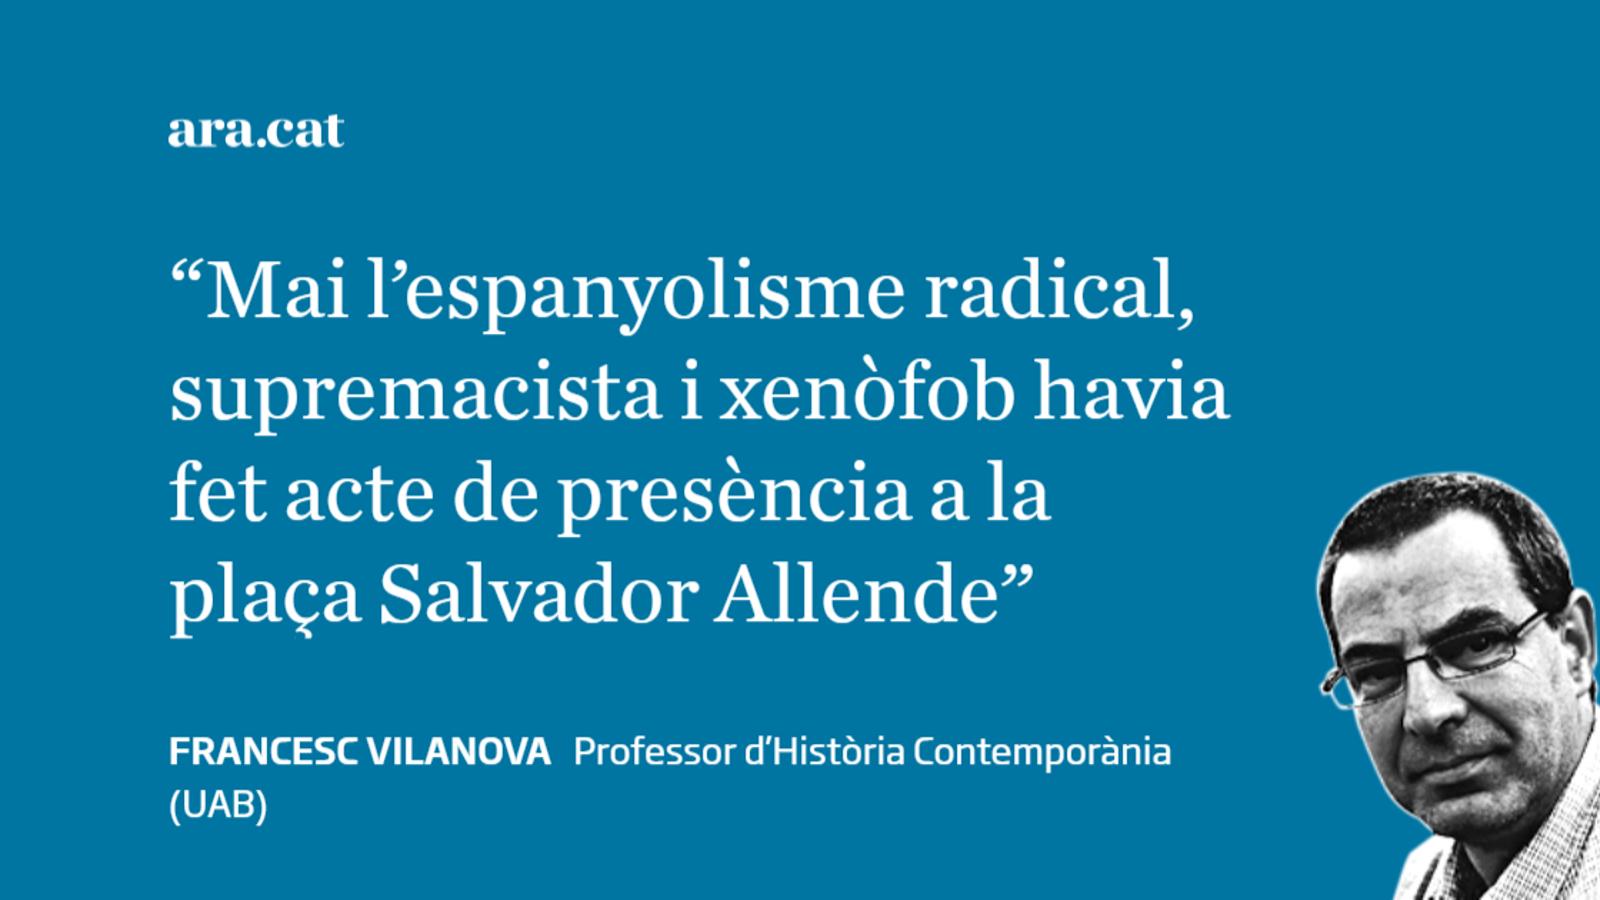 13 de setembre, Salvador Allende